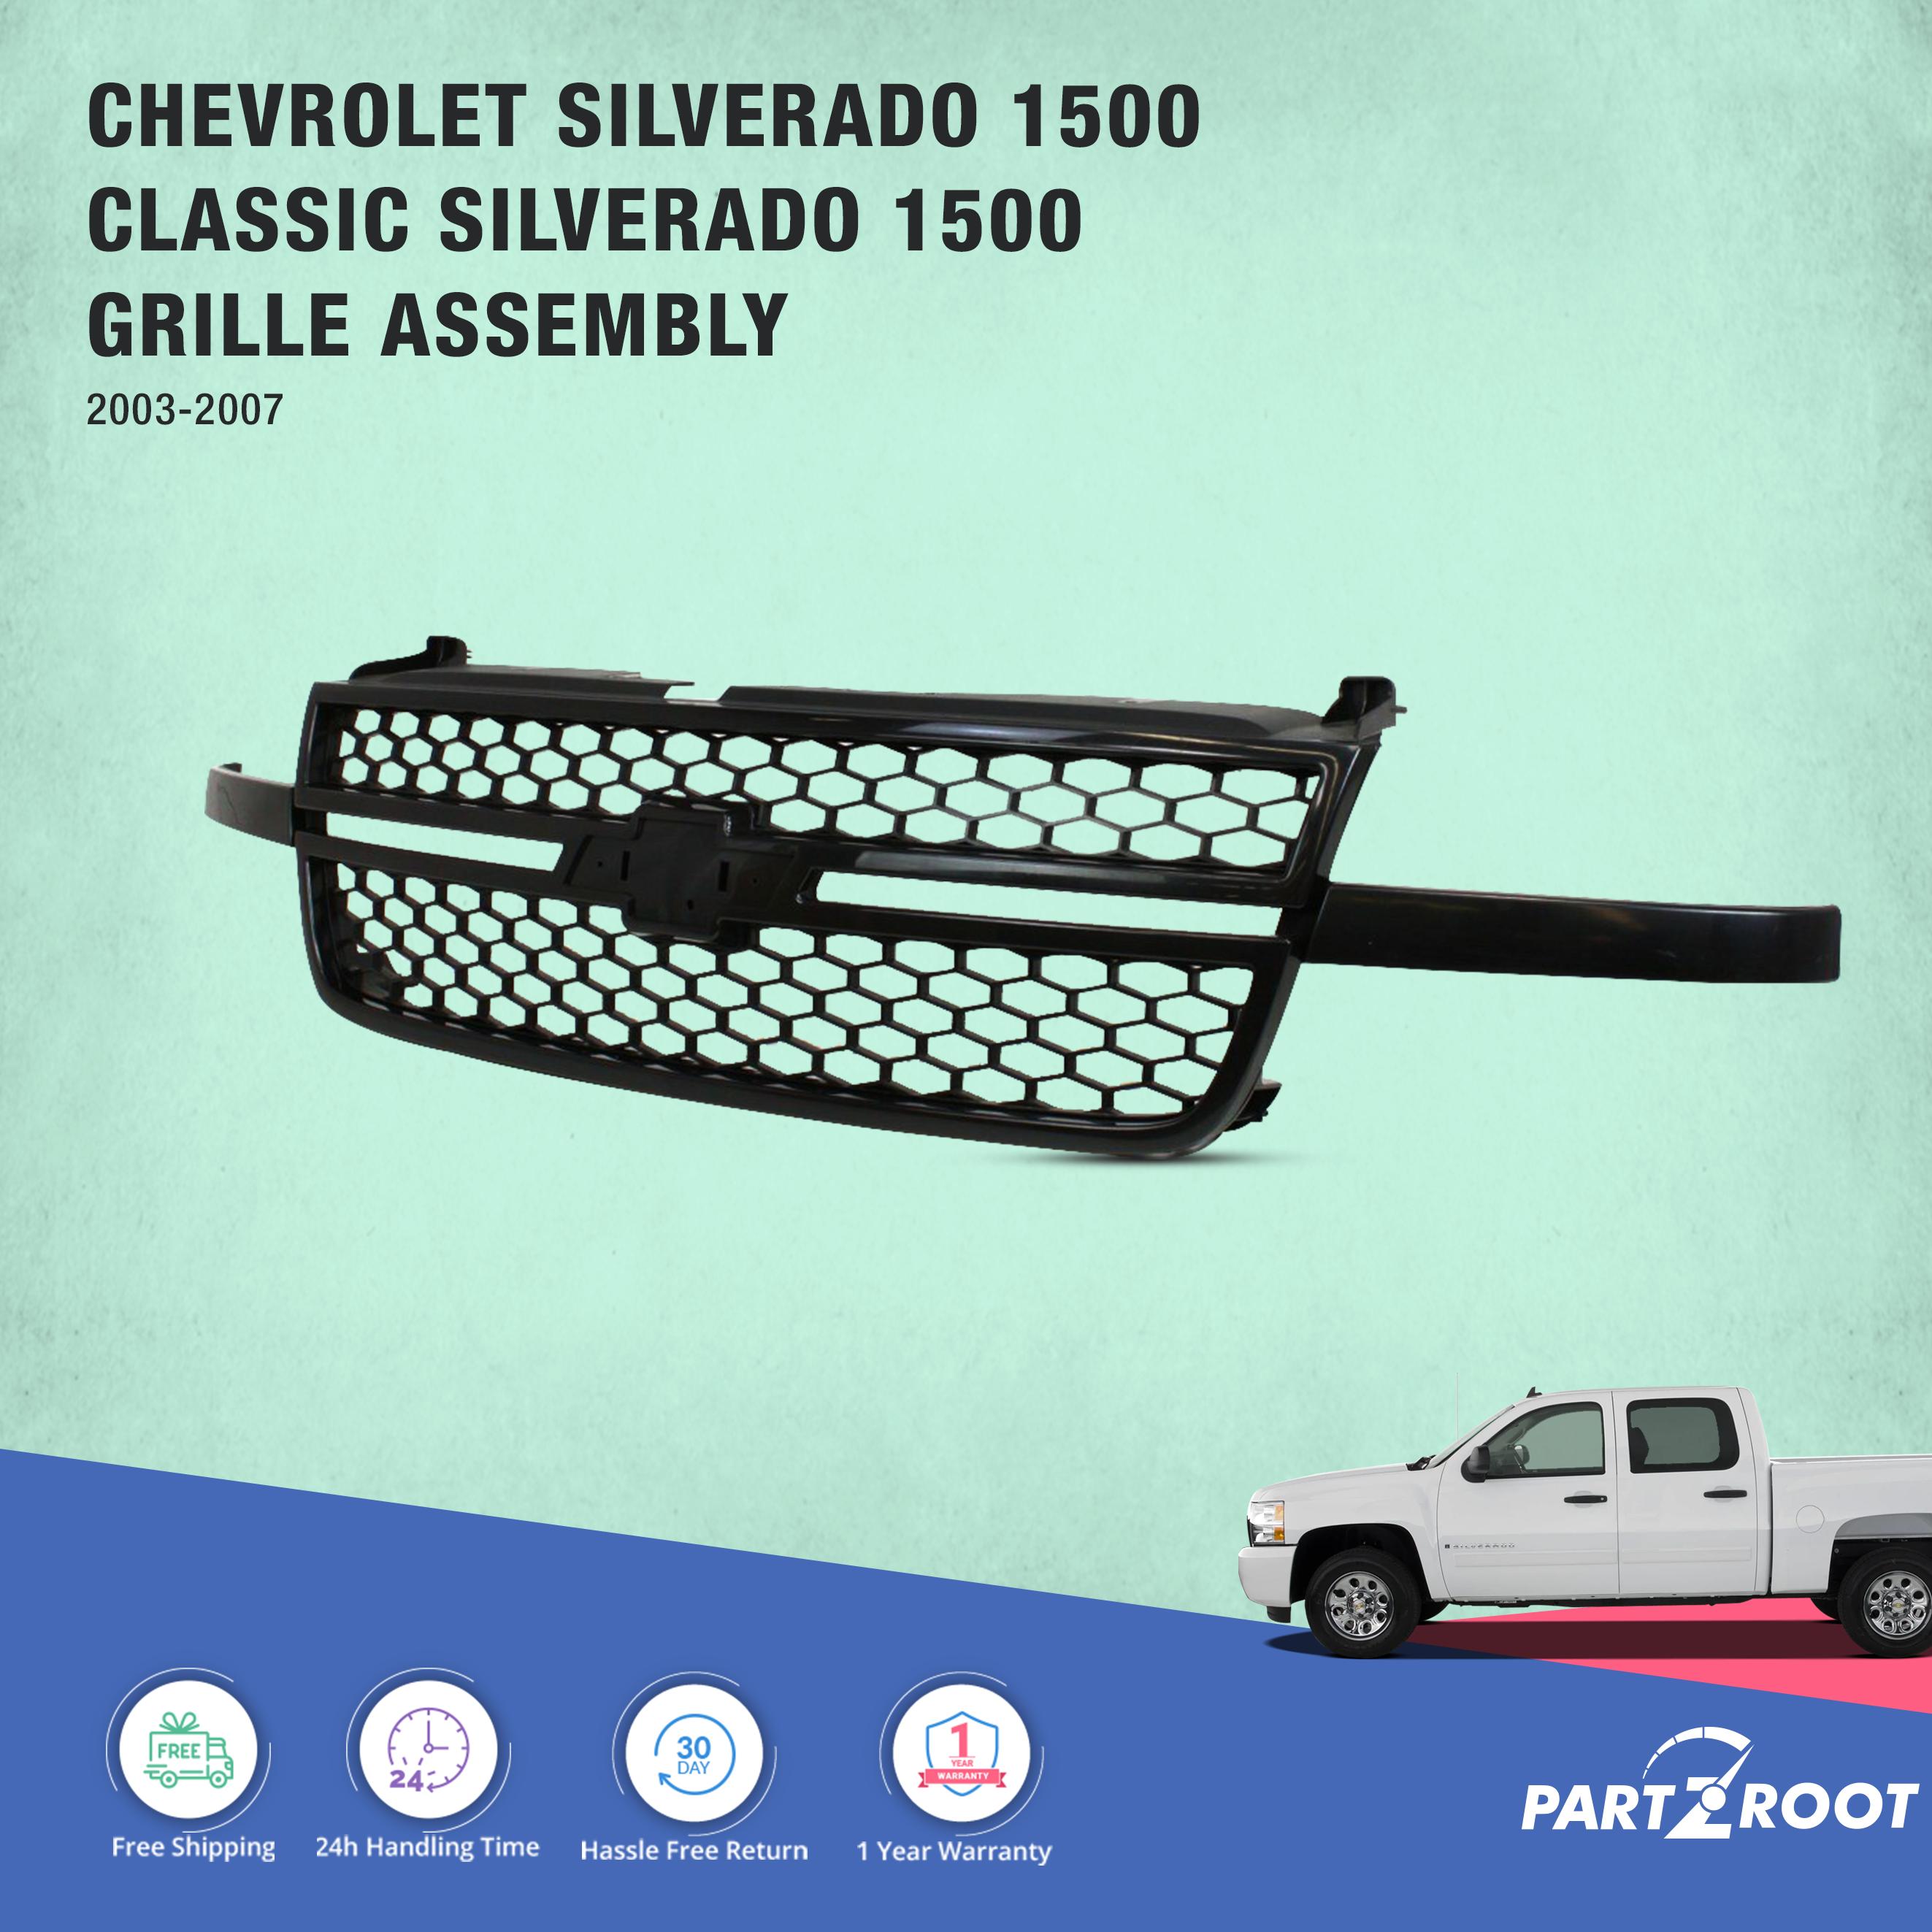 2003 2007 Chevrolet Silverado 1500 Classic Silverado 1500 6 0l